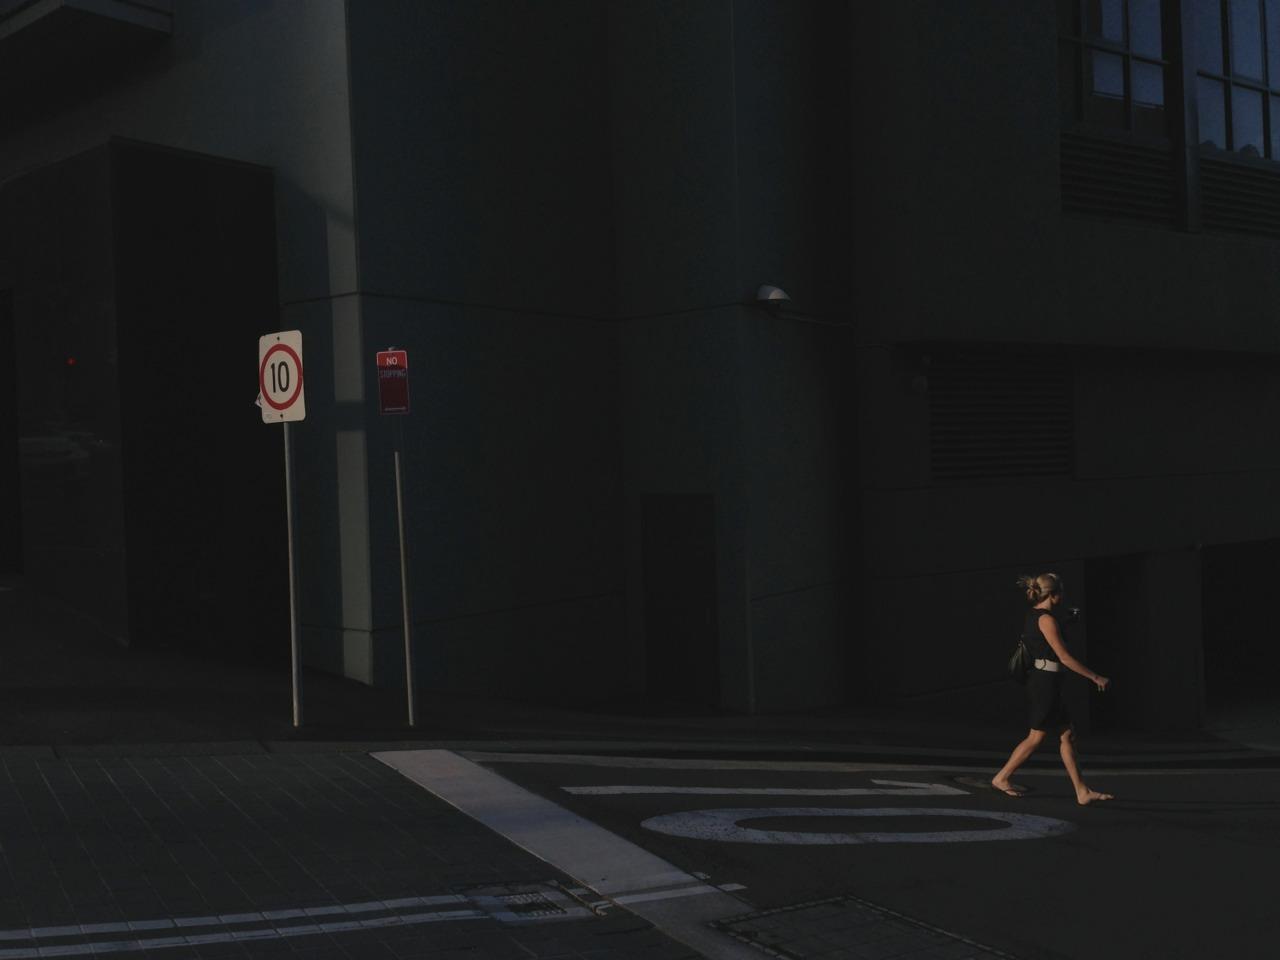 #streetphotography, #sydney, #sydneymorningphoto